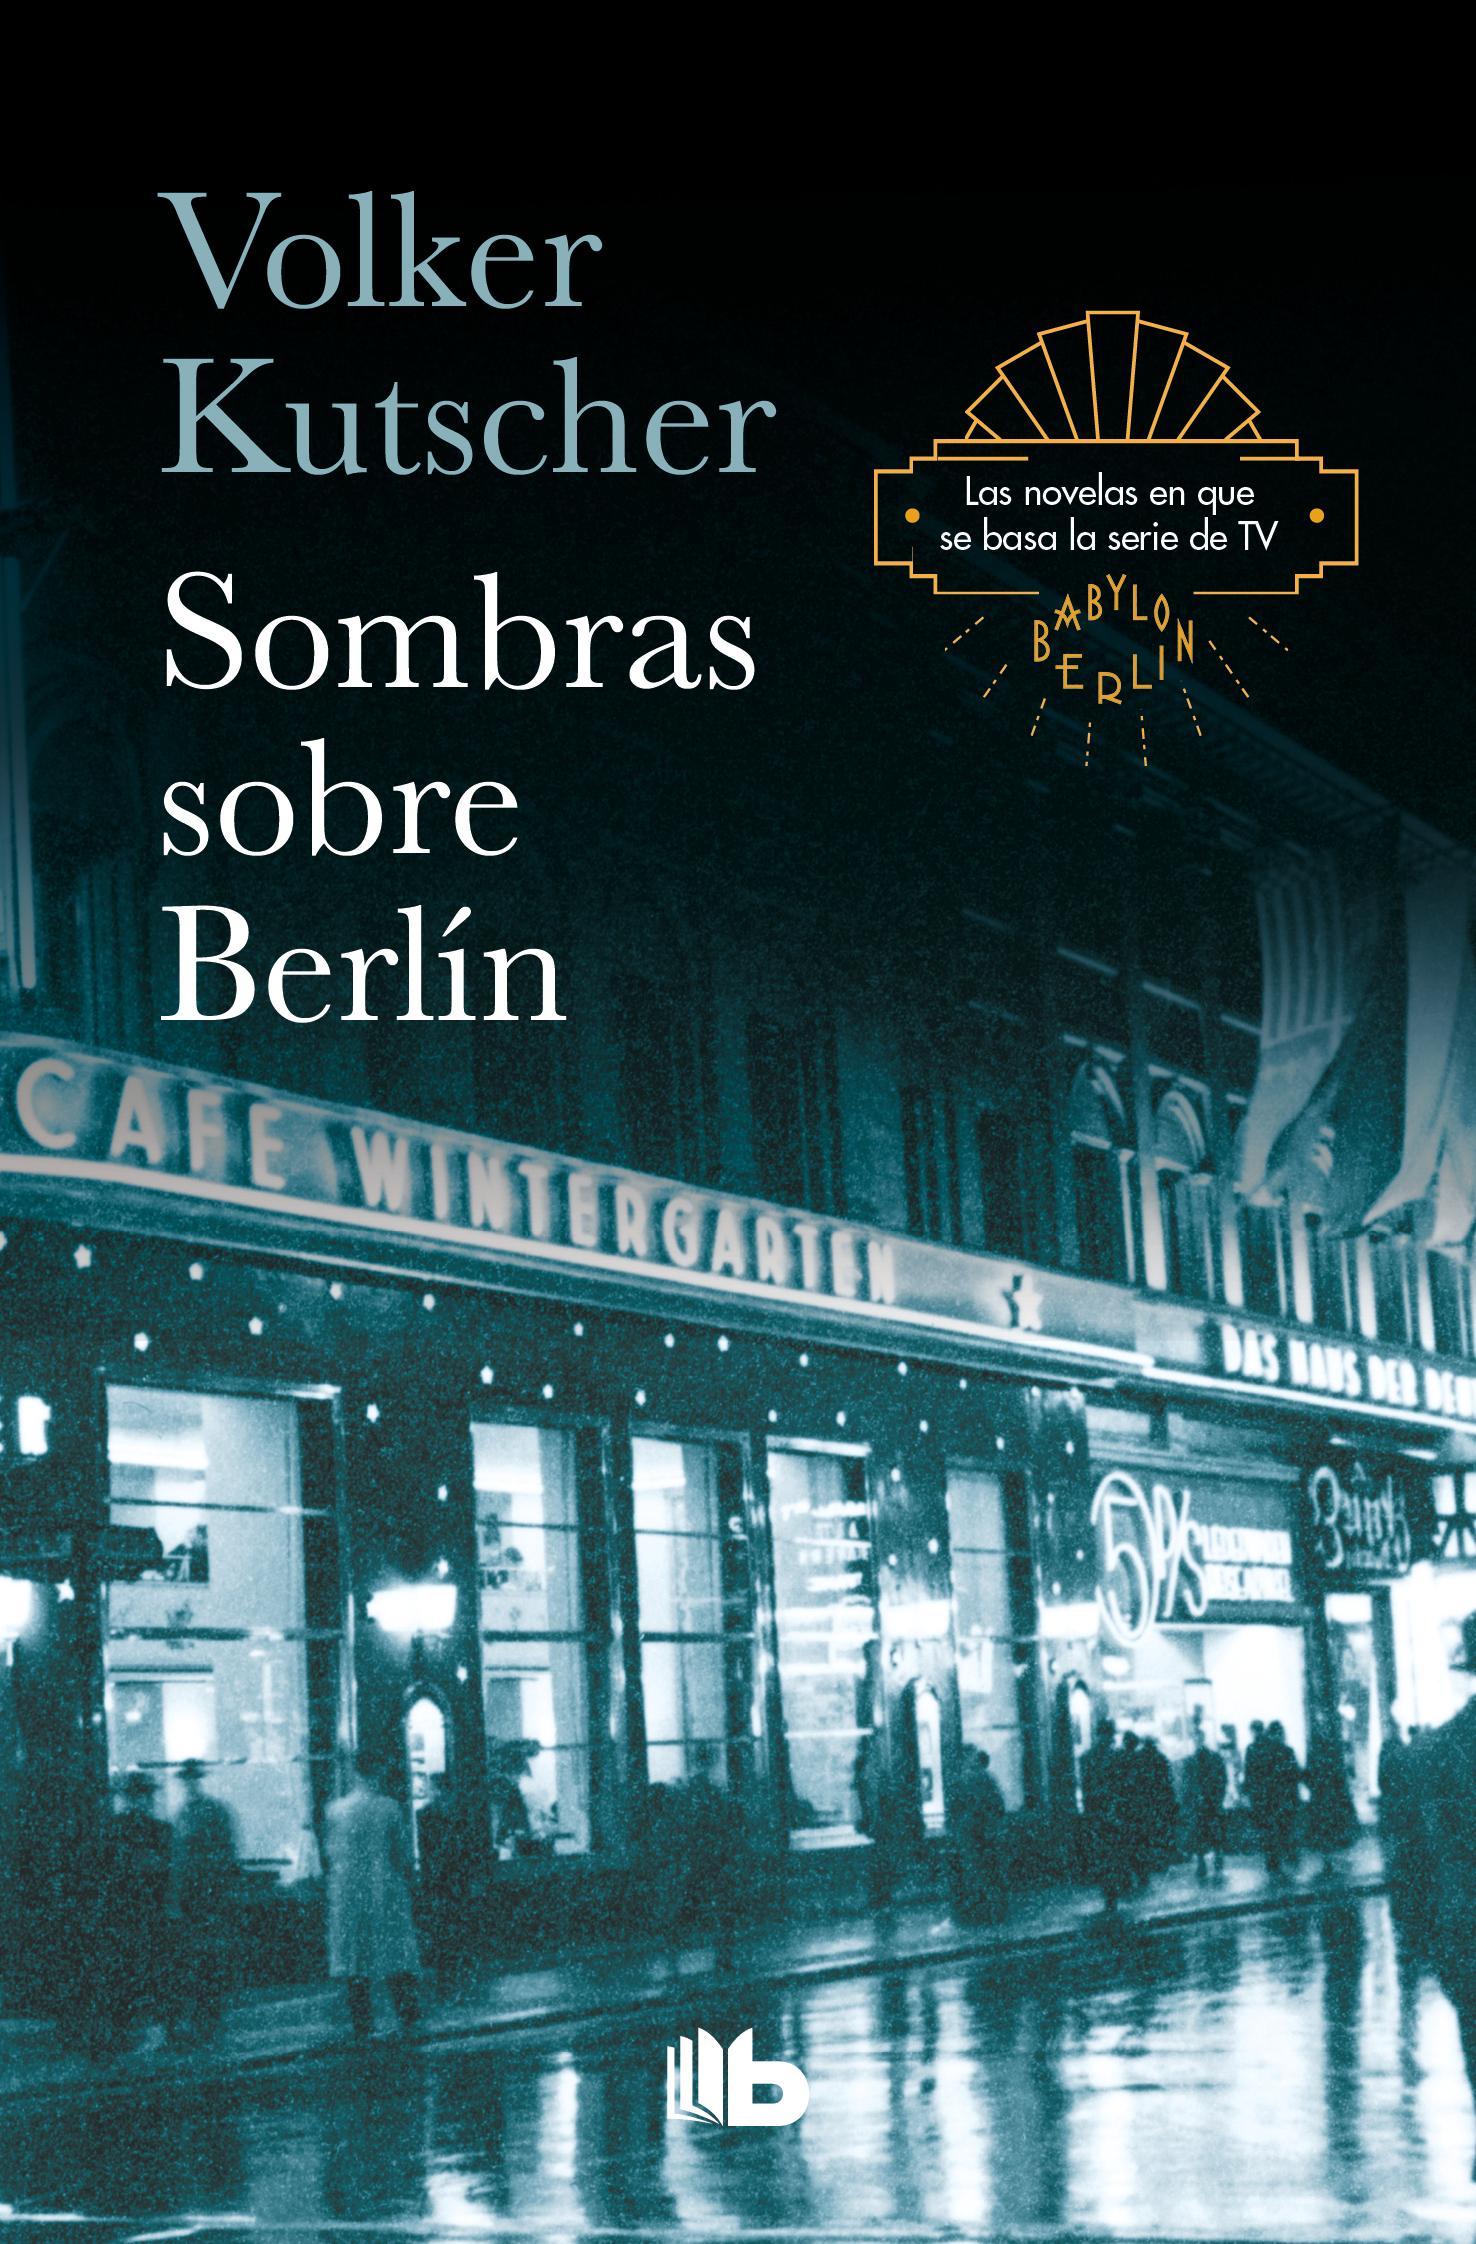 SOMBRAS SOBRE BERLíN